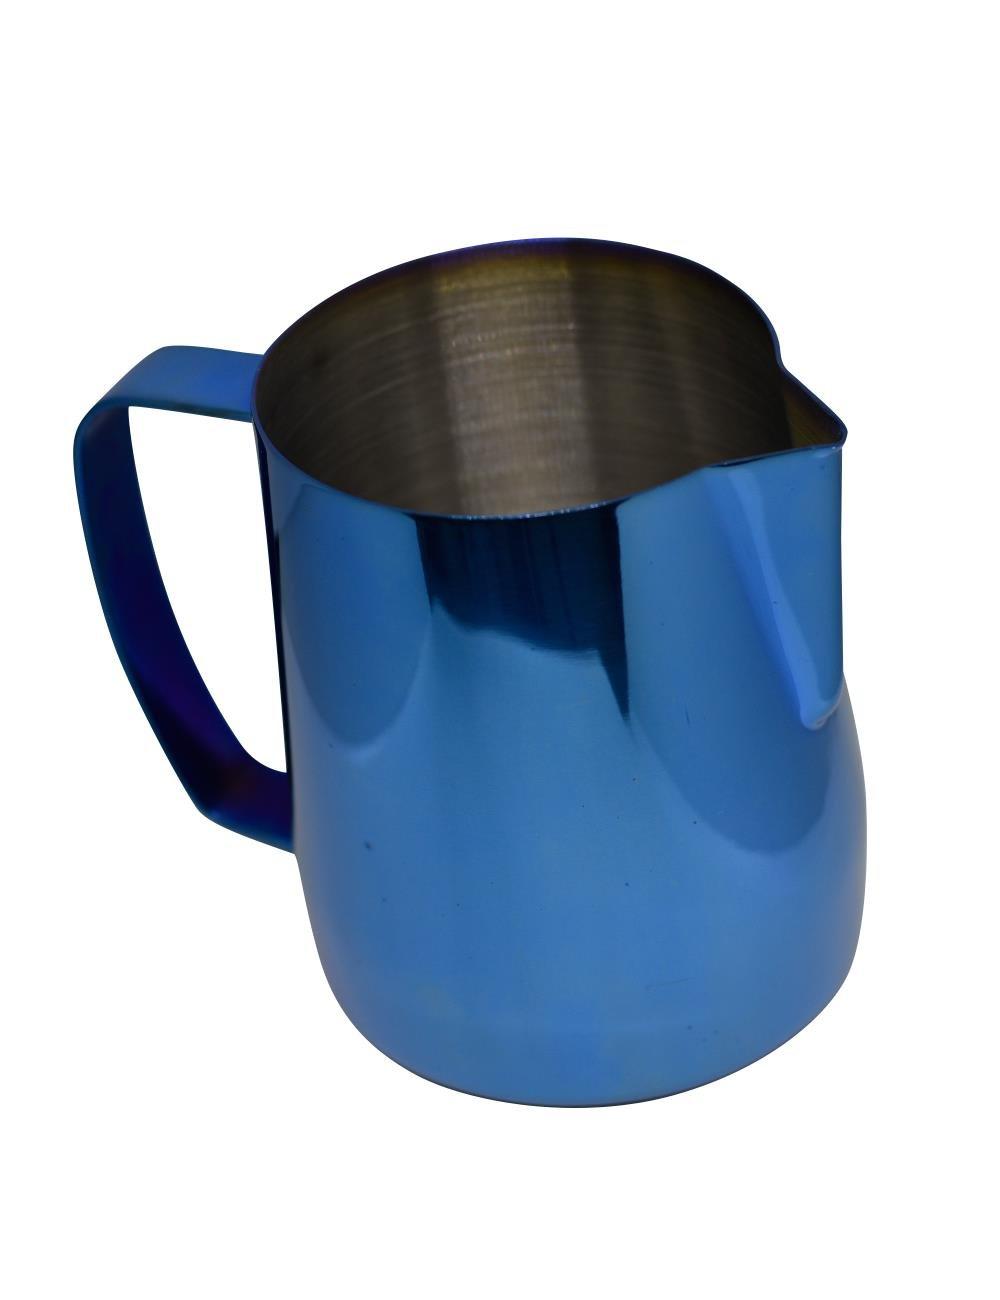 Latte Art   Stainless Steel Milk Frothing Pitcher Cobalt Blue 20 oz Titanium Mirror Finish